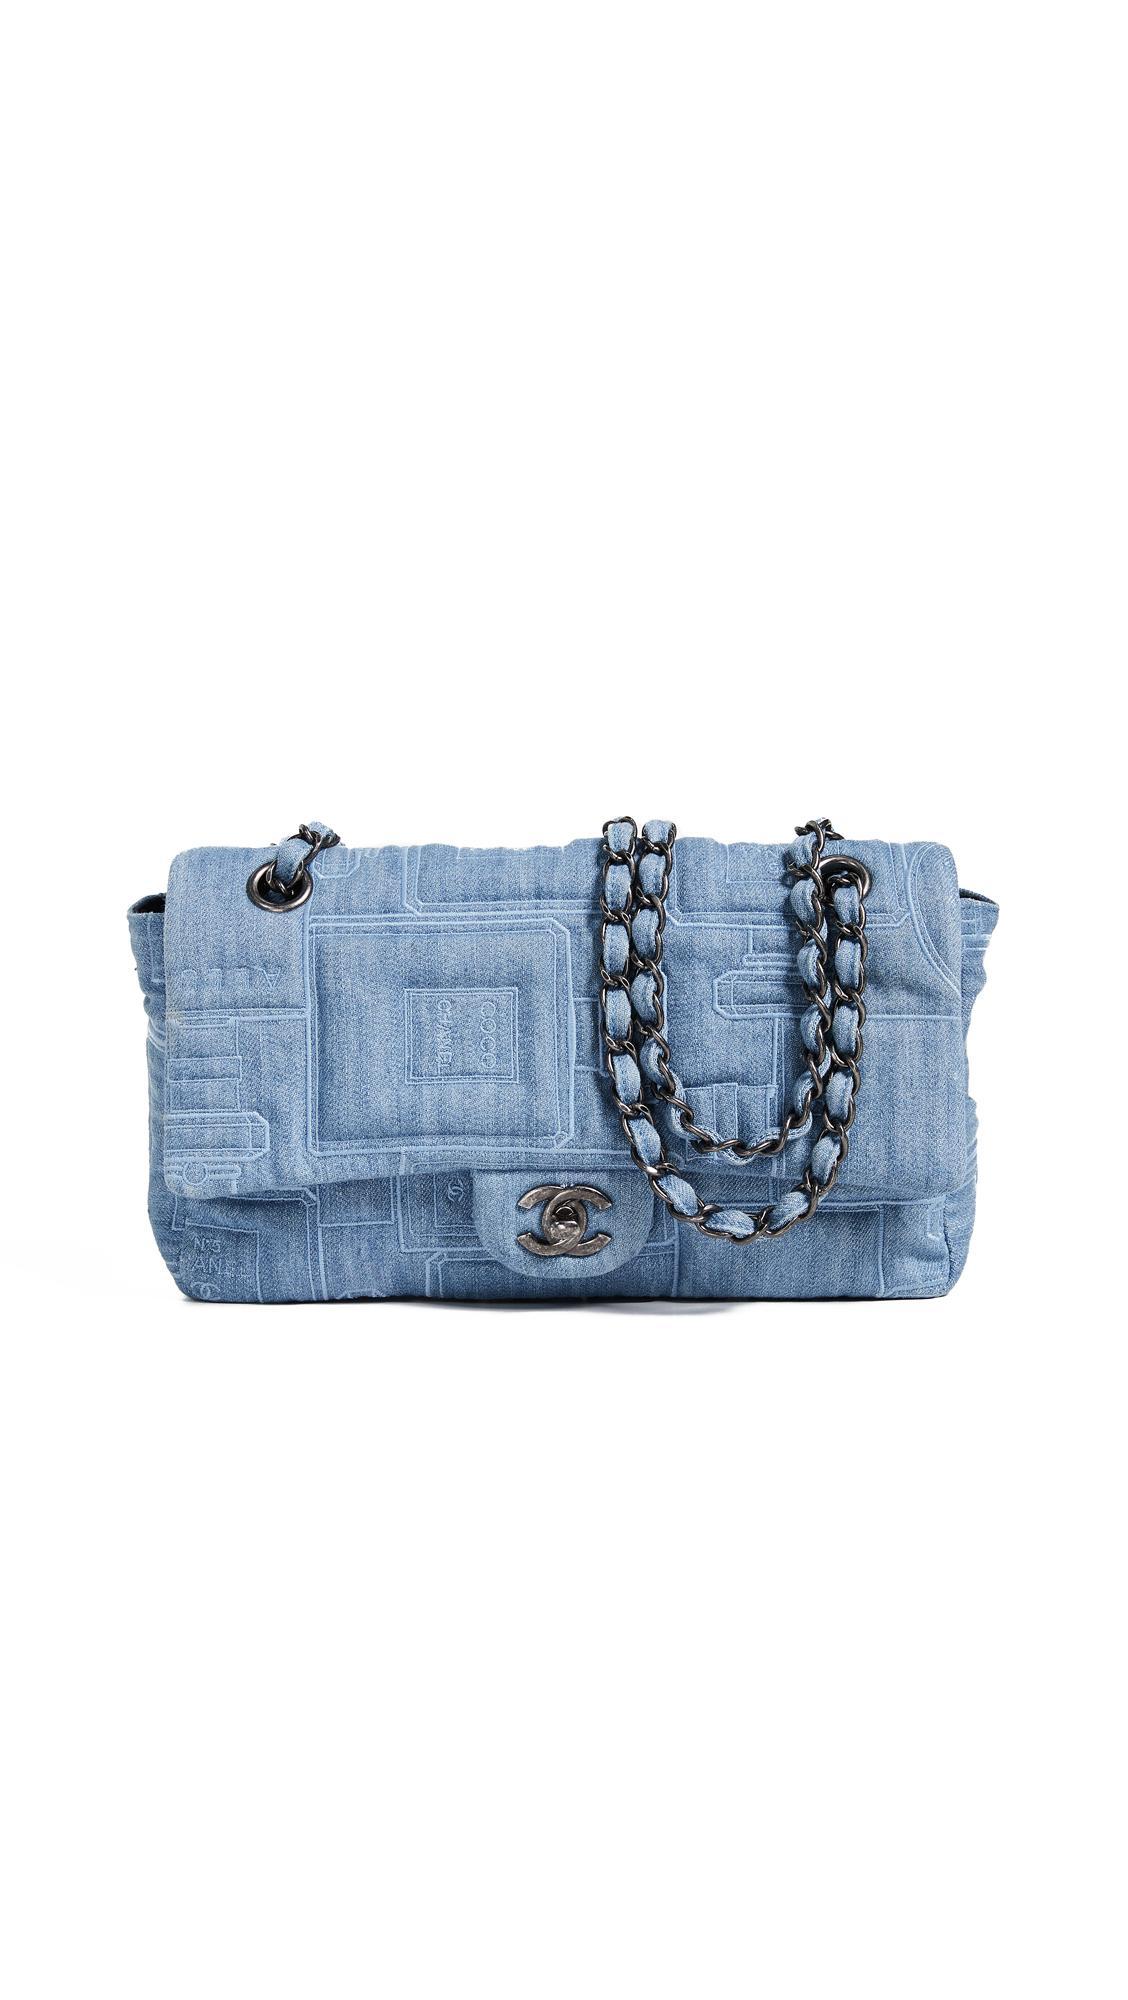 45000cd8a0dfa1 What Goes Around Comes Around Chanel Blue Denim Half Flap 10